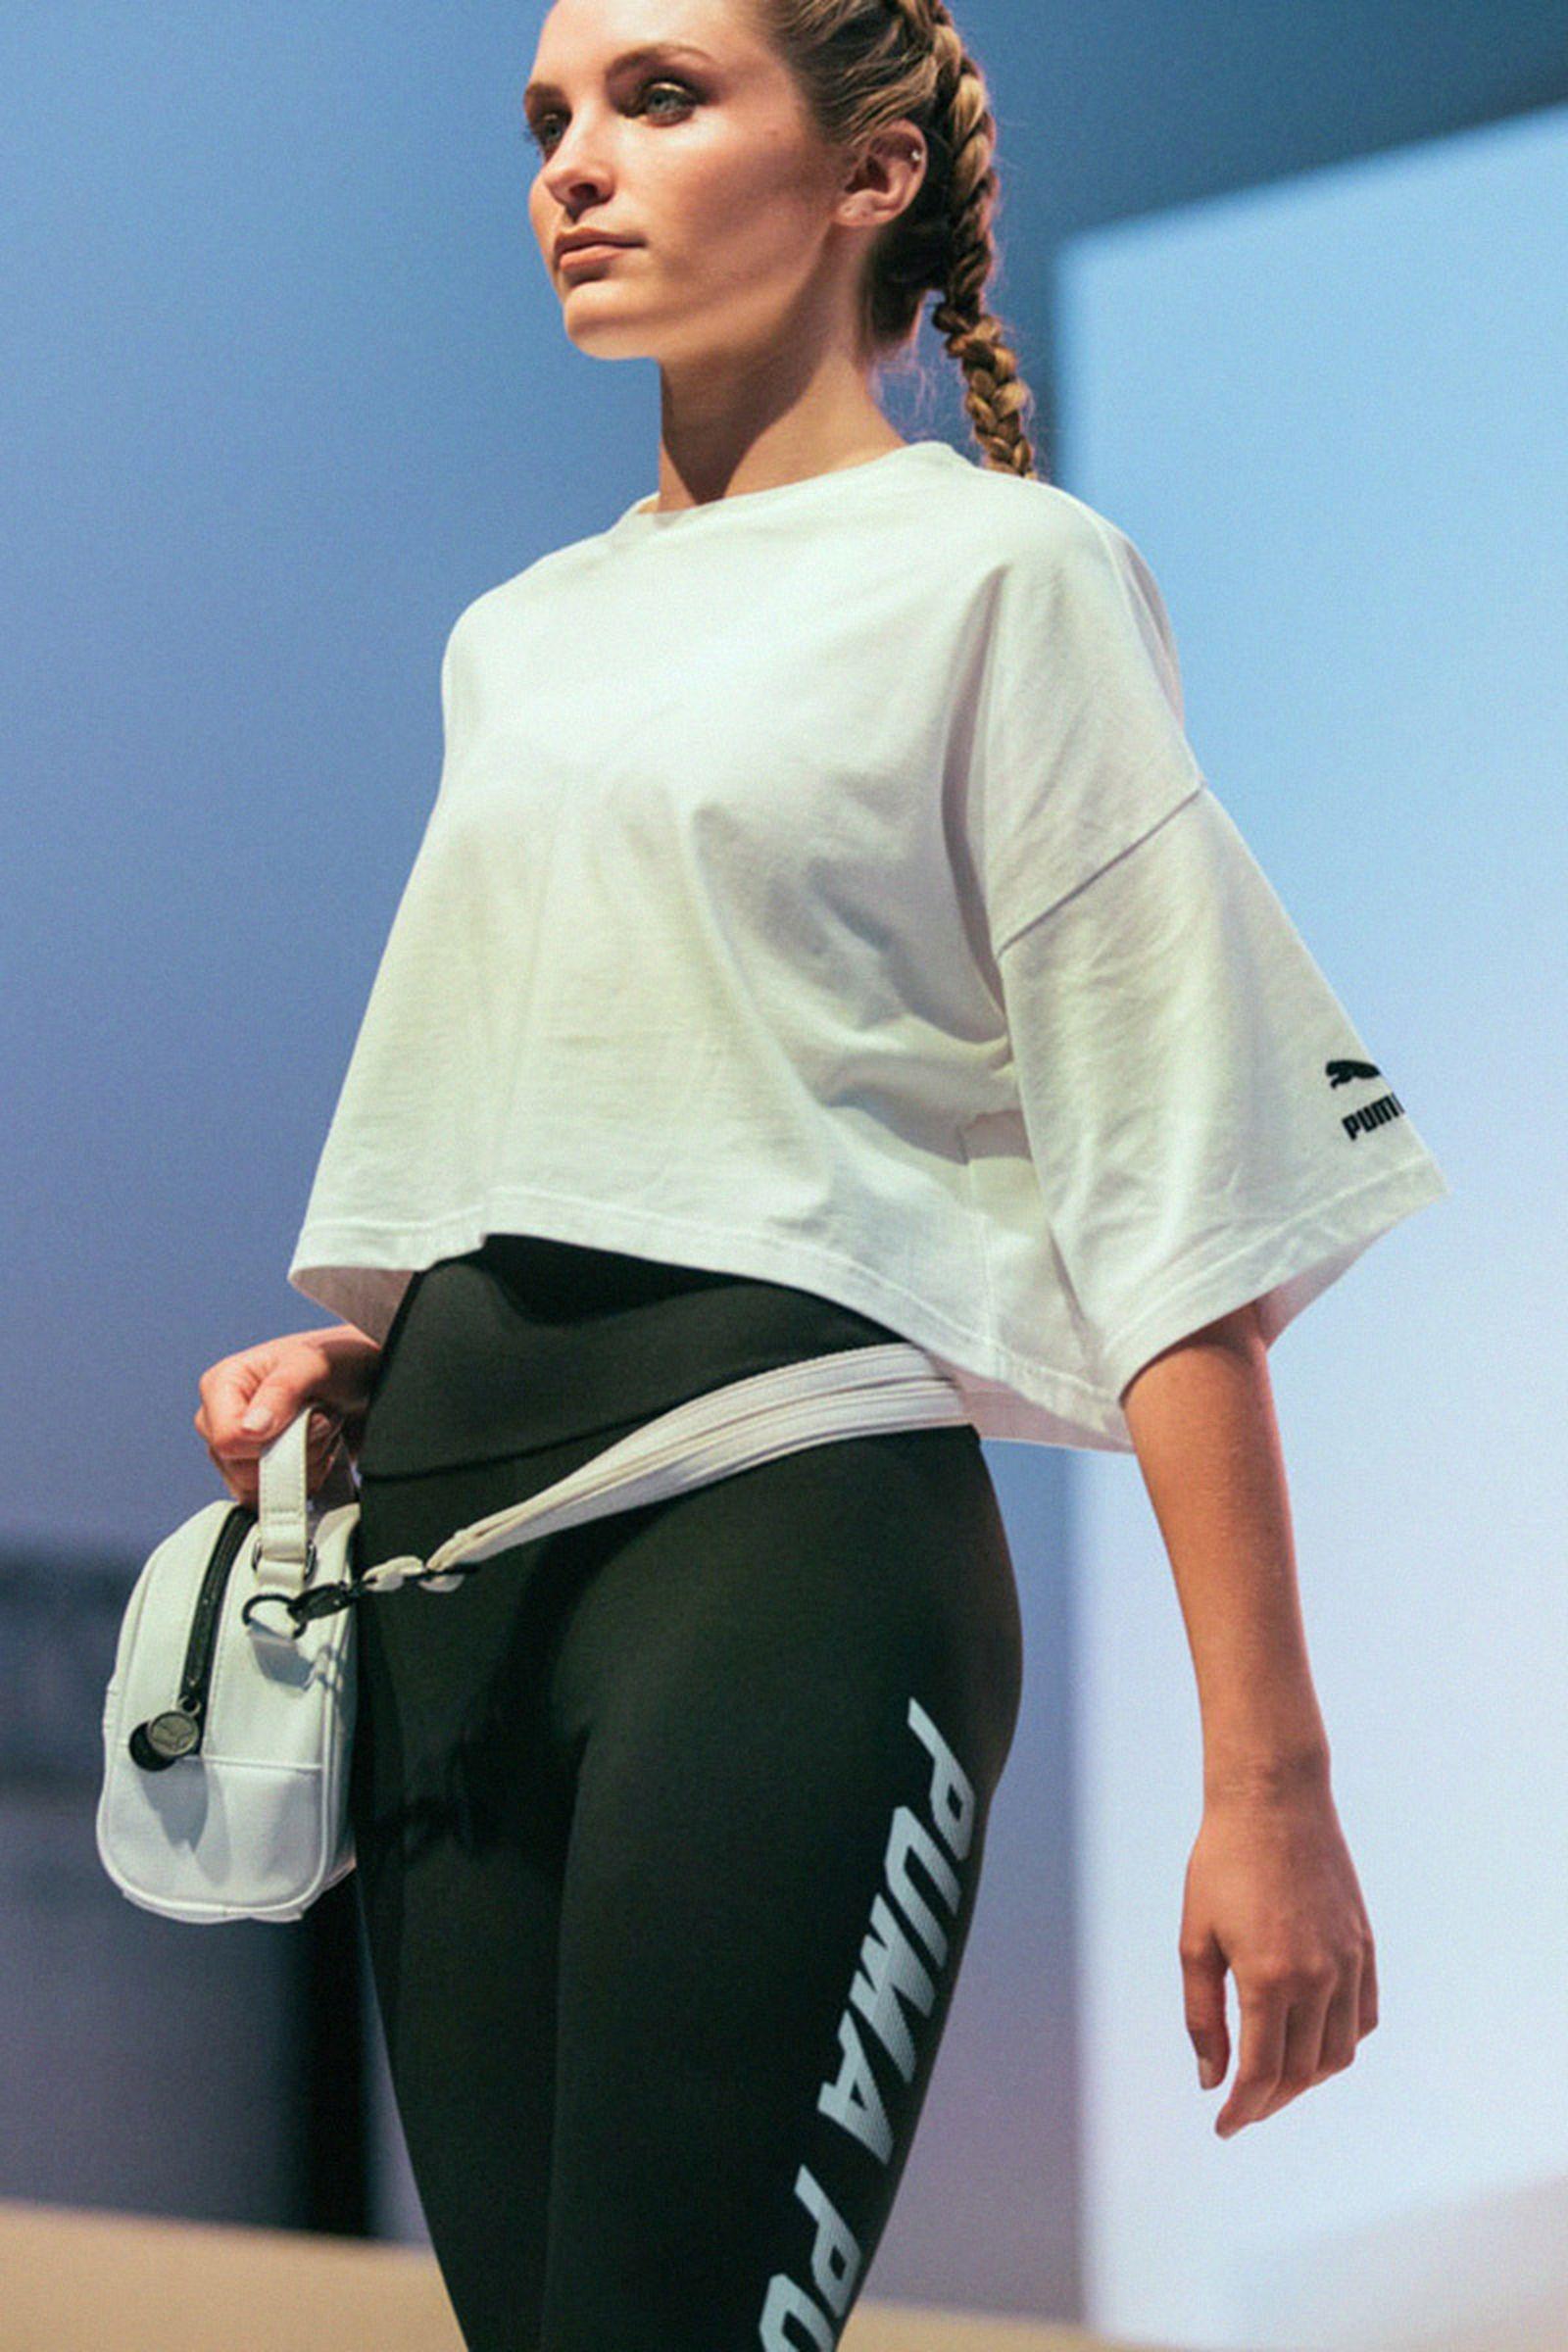 german clothing brands puma 023c Adidas Boulezar